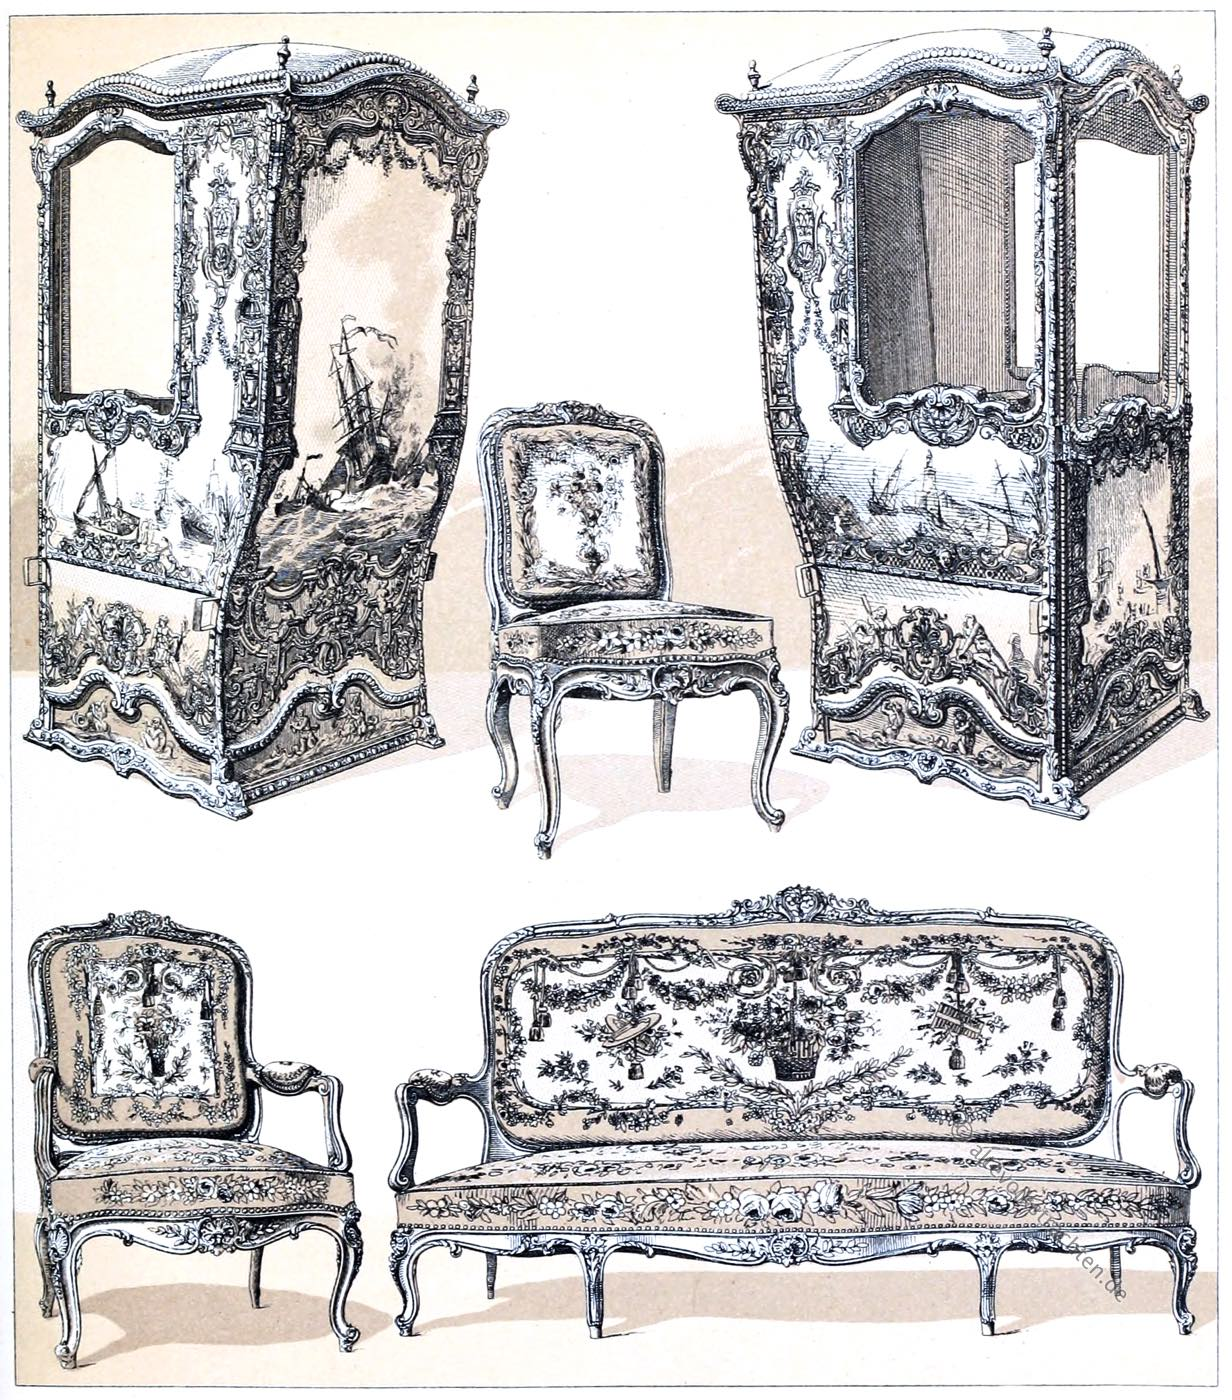 Sänfte, Rokoko, Louis Quinze, Prachtsessel, Möbel,